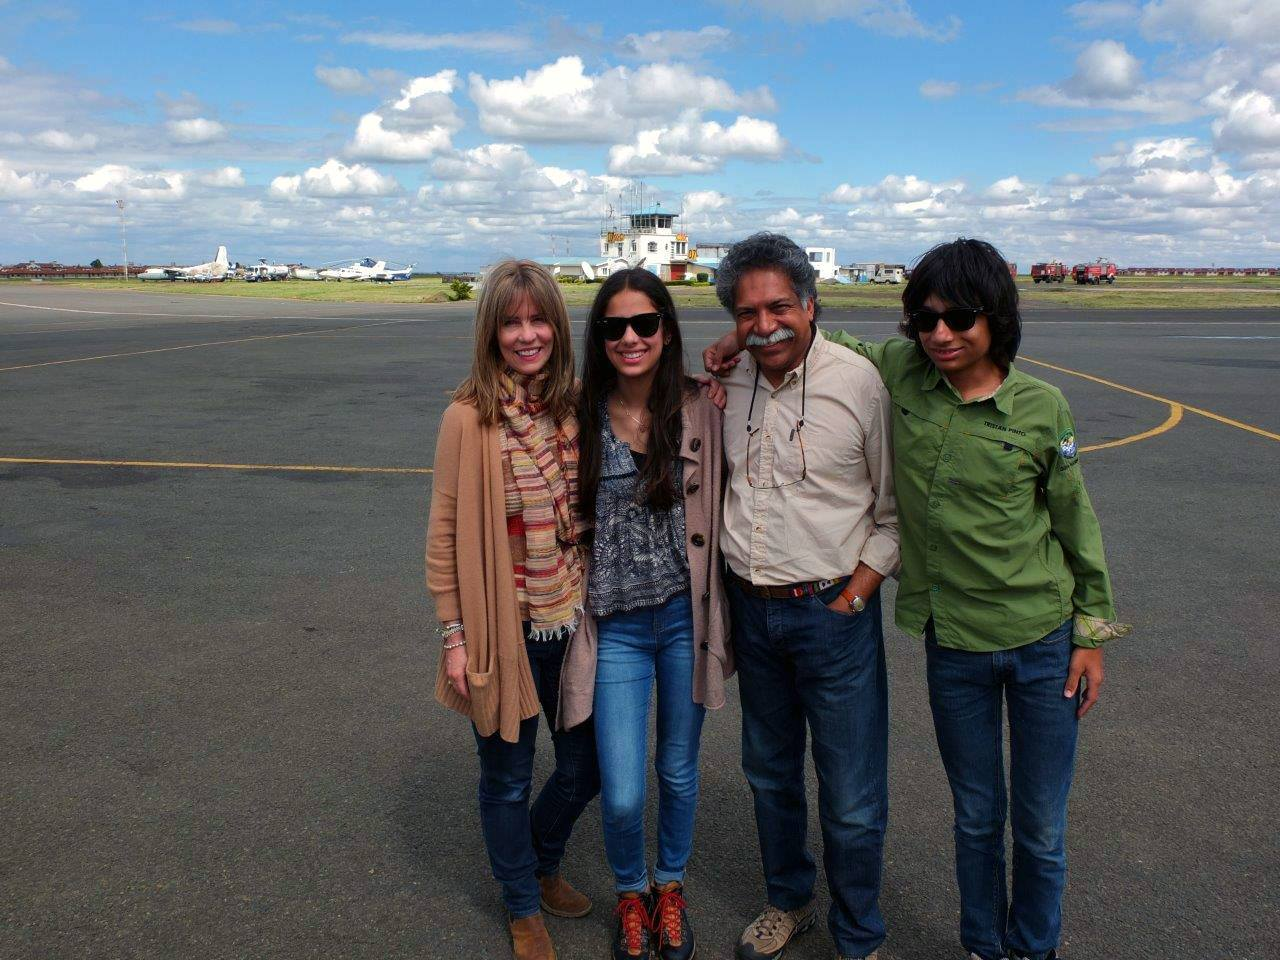 Pinto family on an airstrip